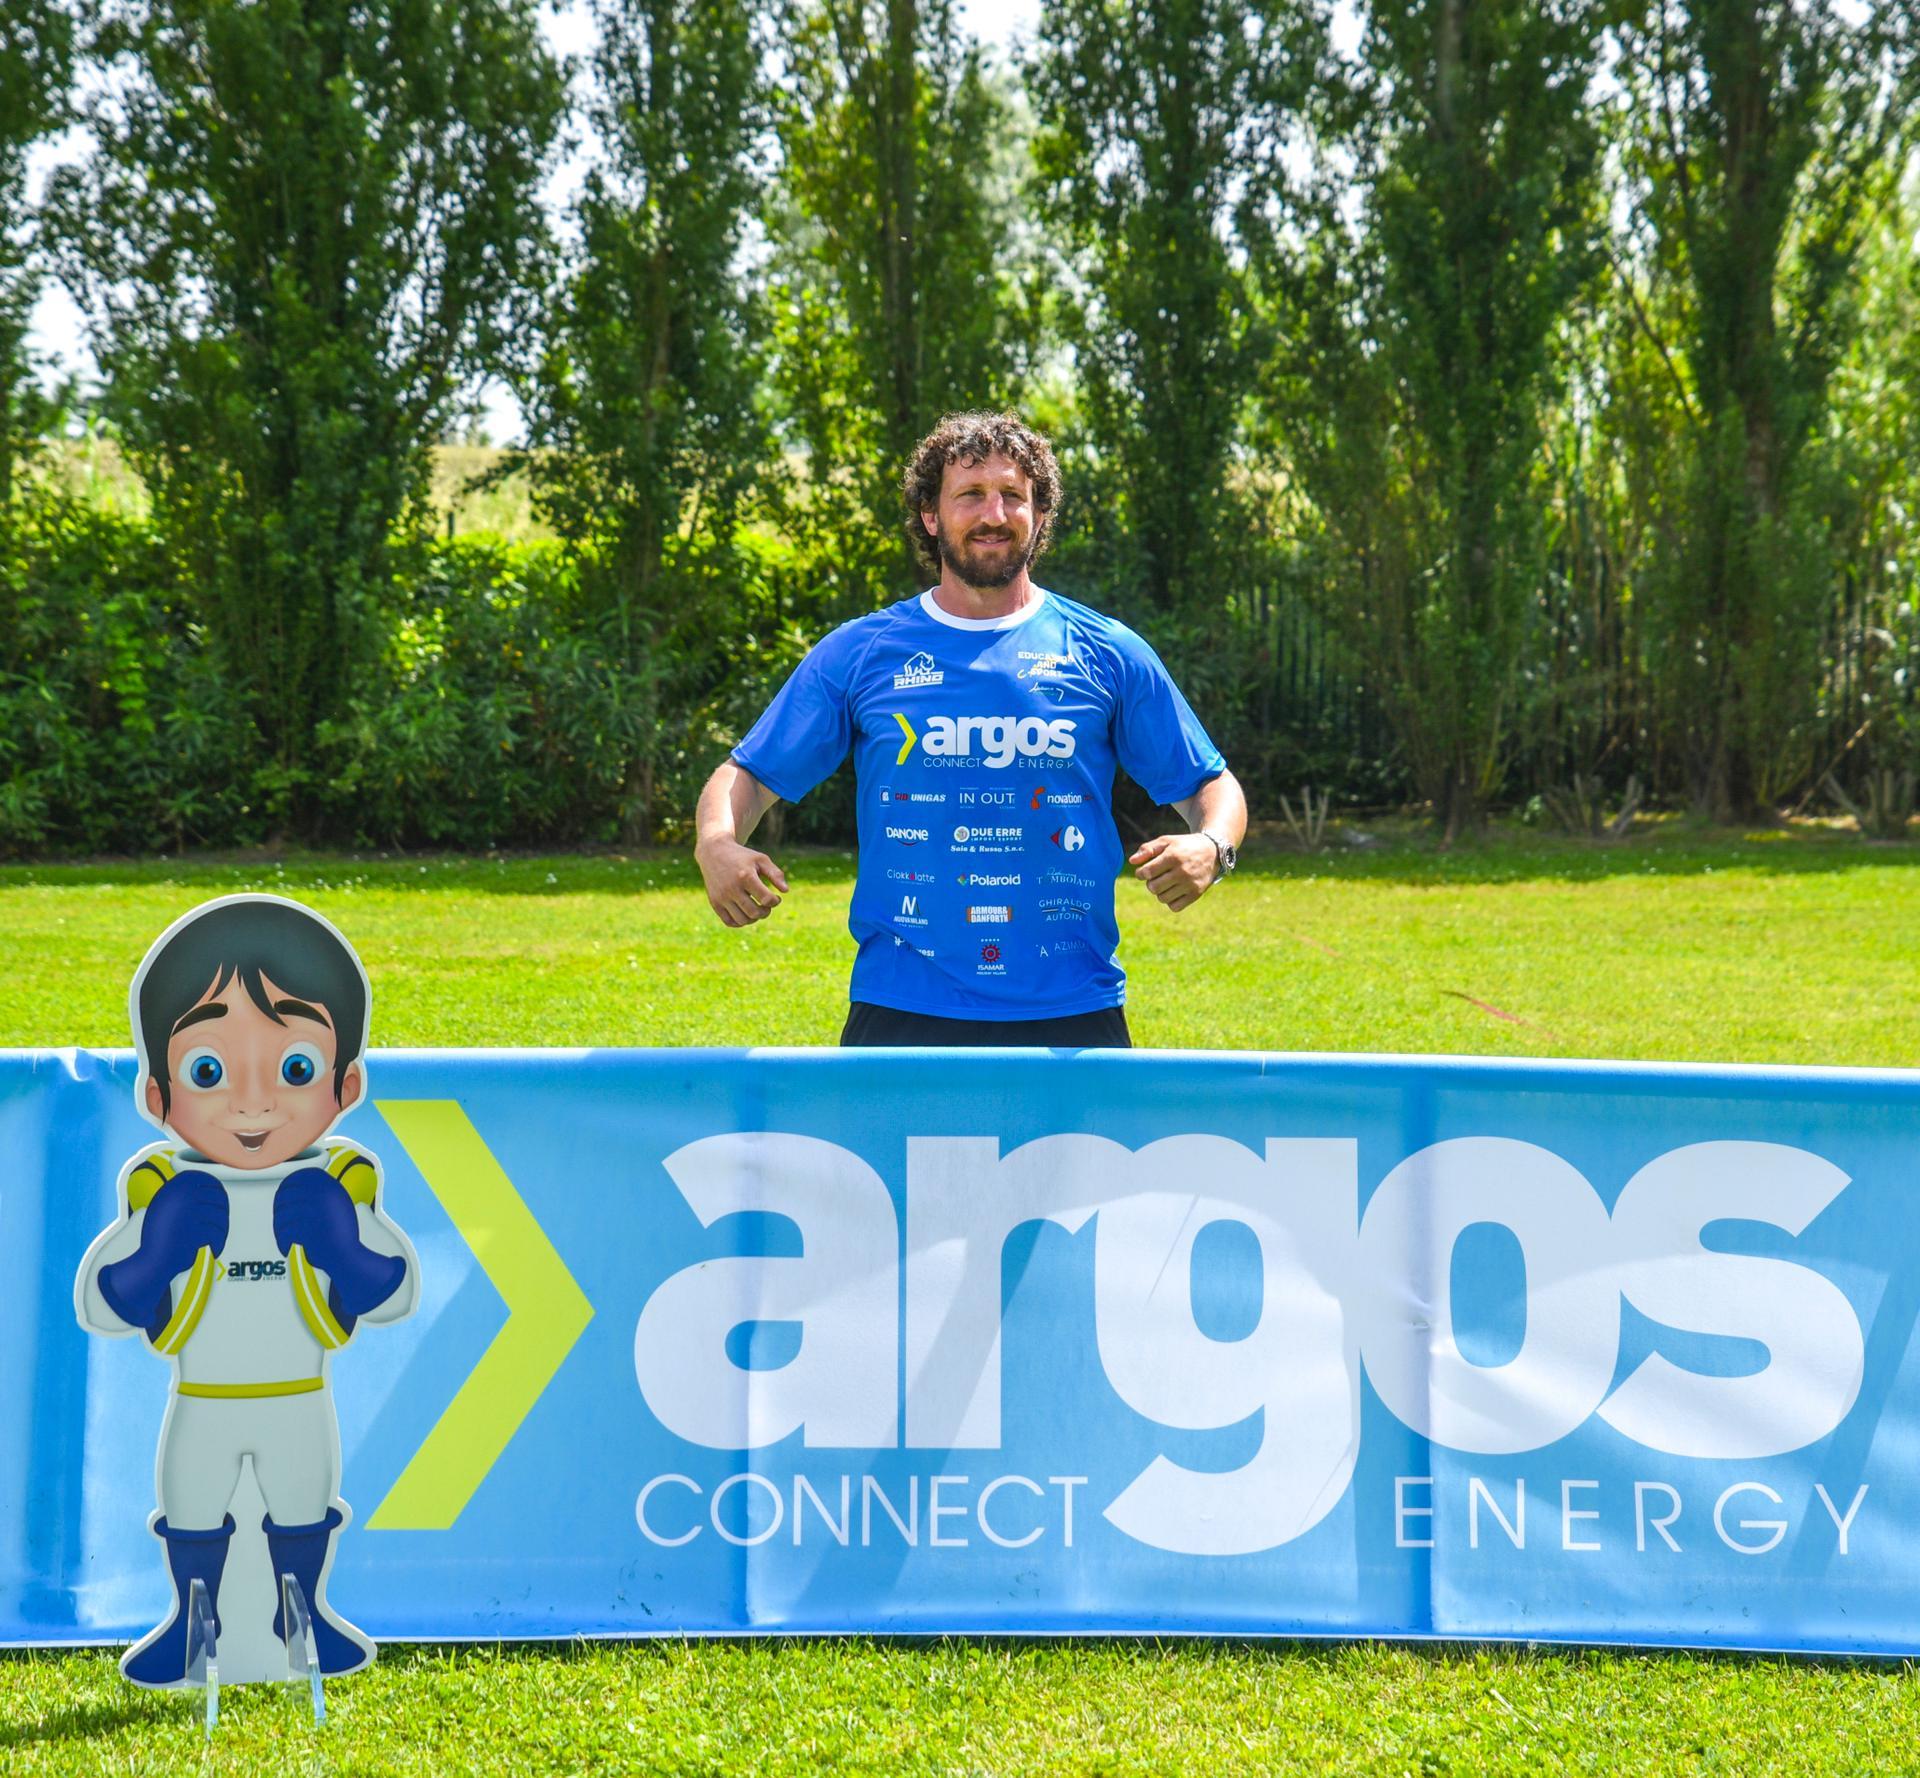 Campus Rugby Mauro Bergamasco 2